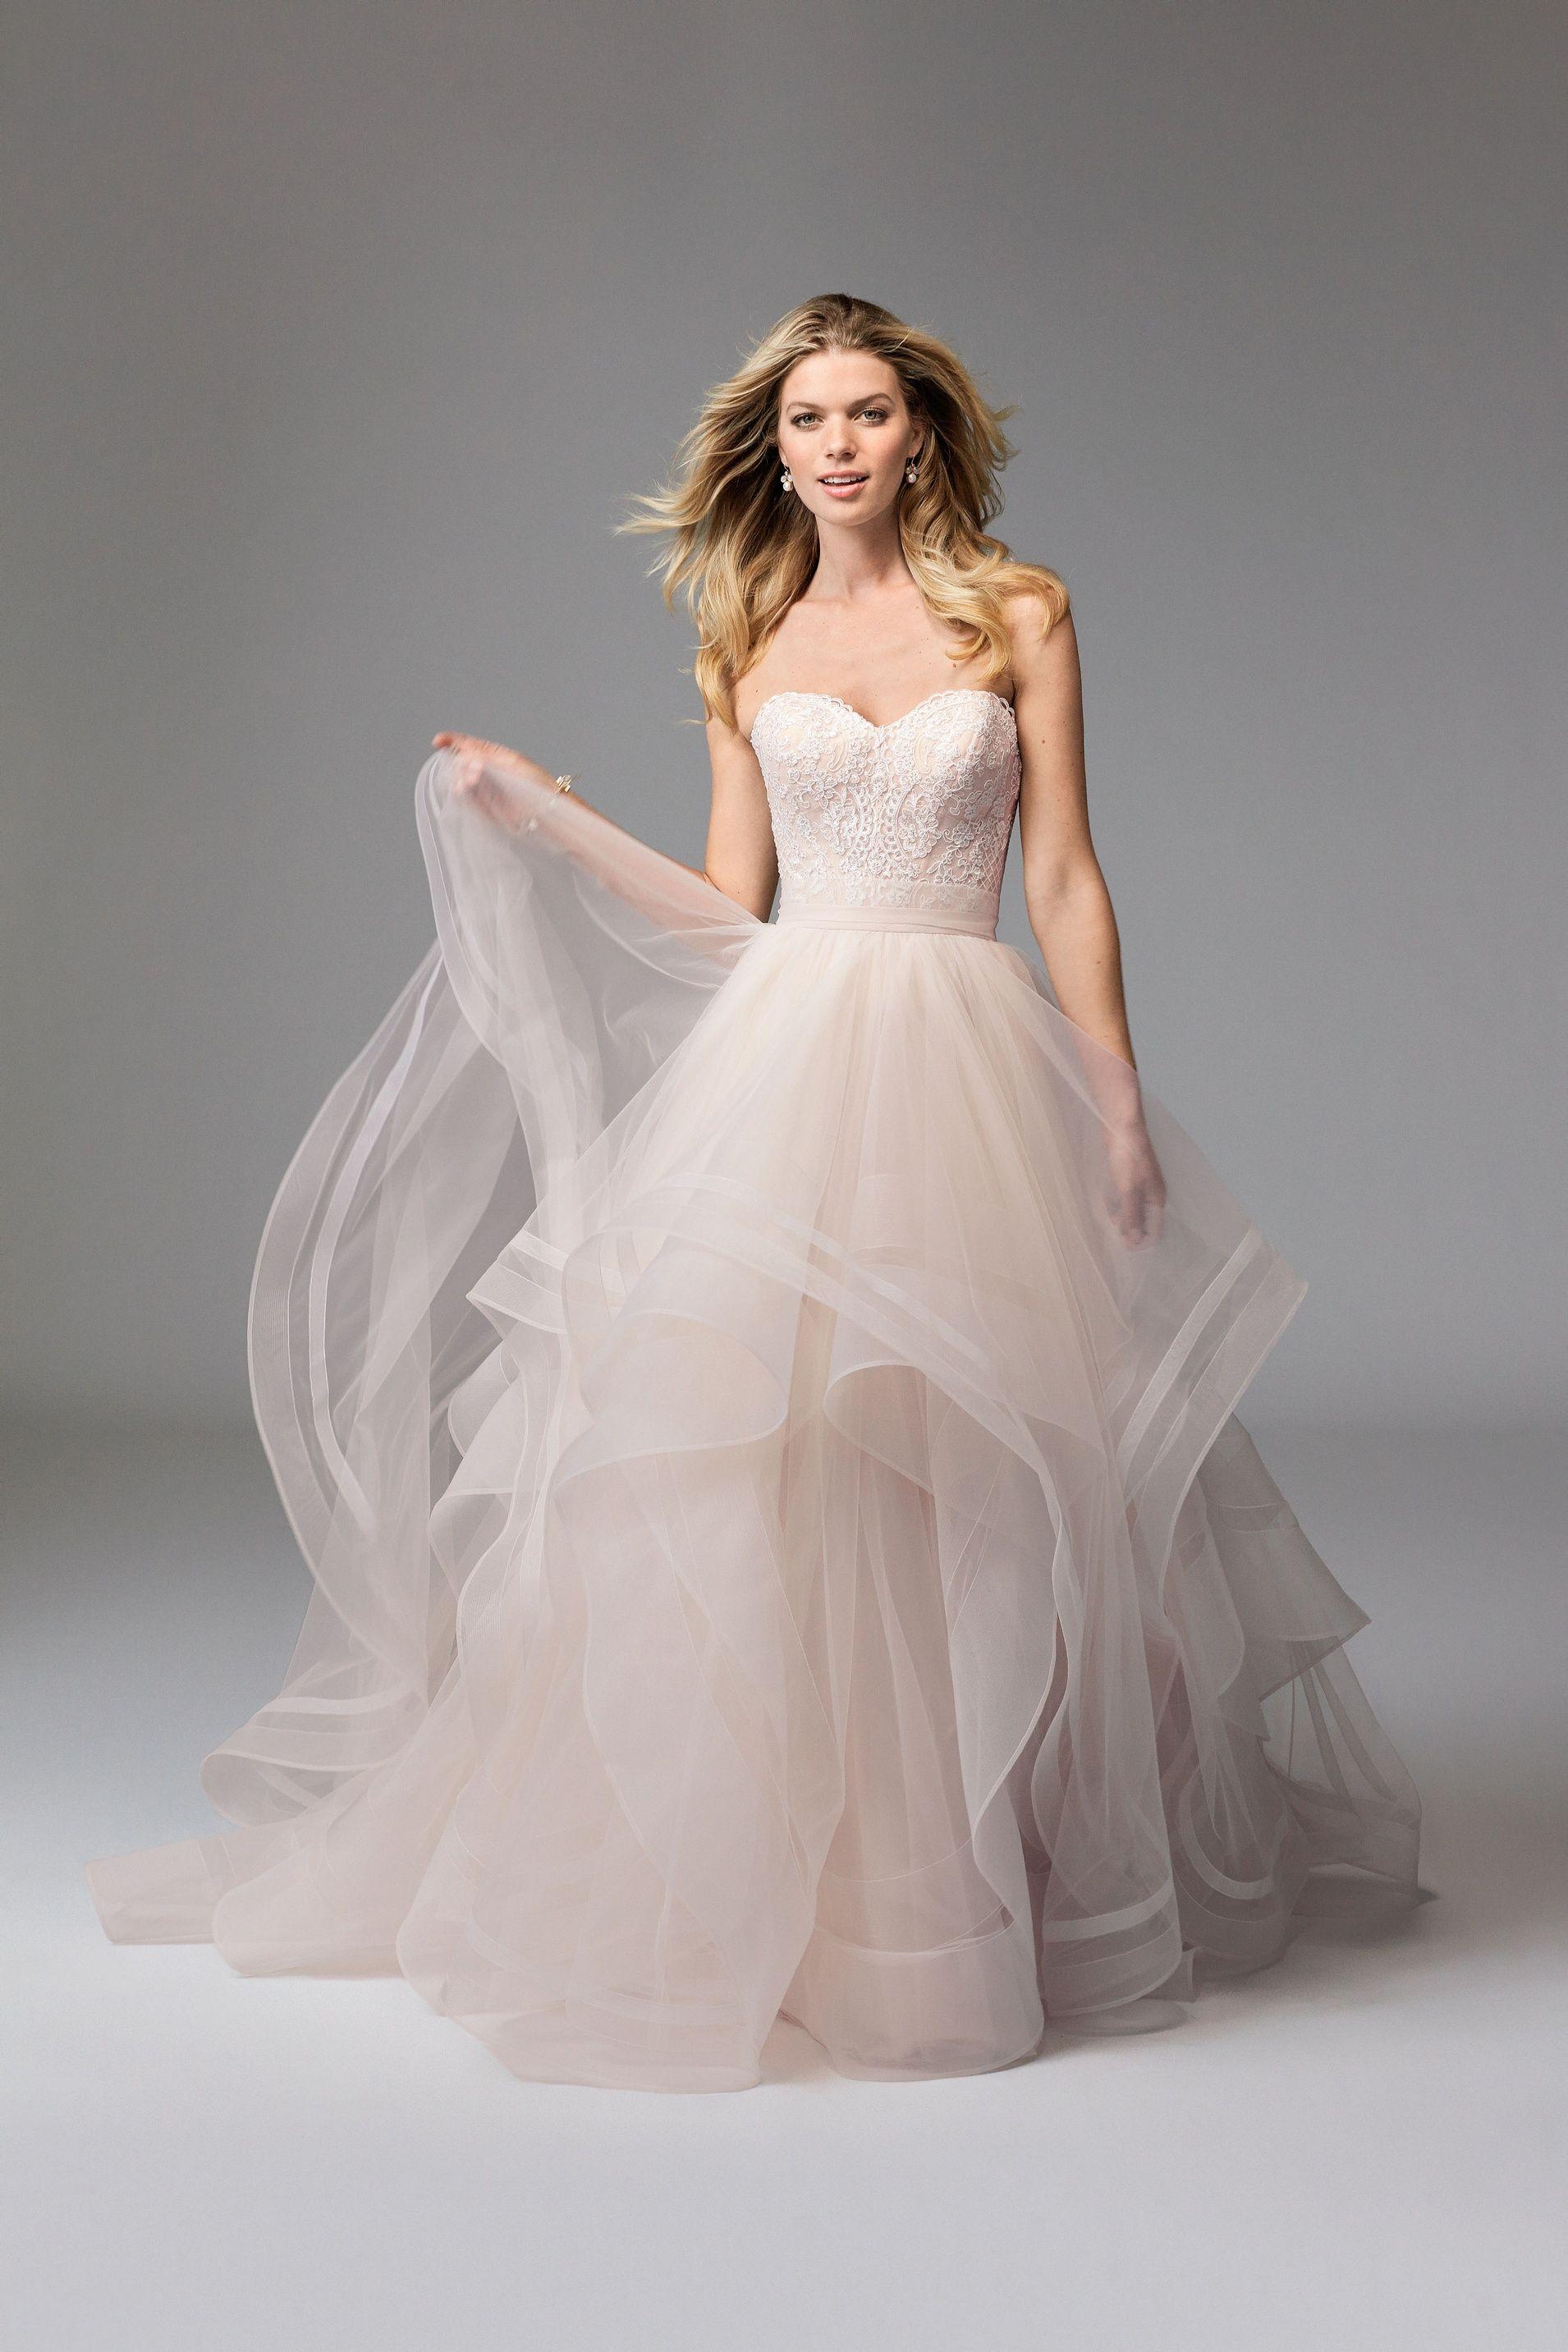 da70c5e70b0 Wtoo Bridal Separates  Lula Corset   Effie Skirt